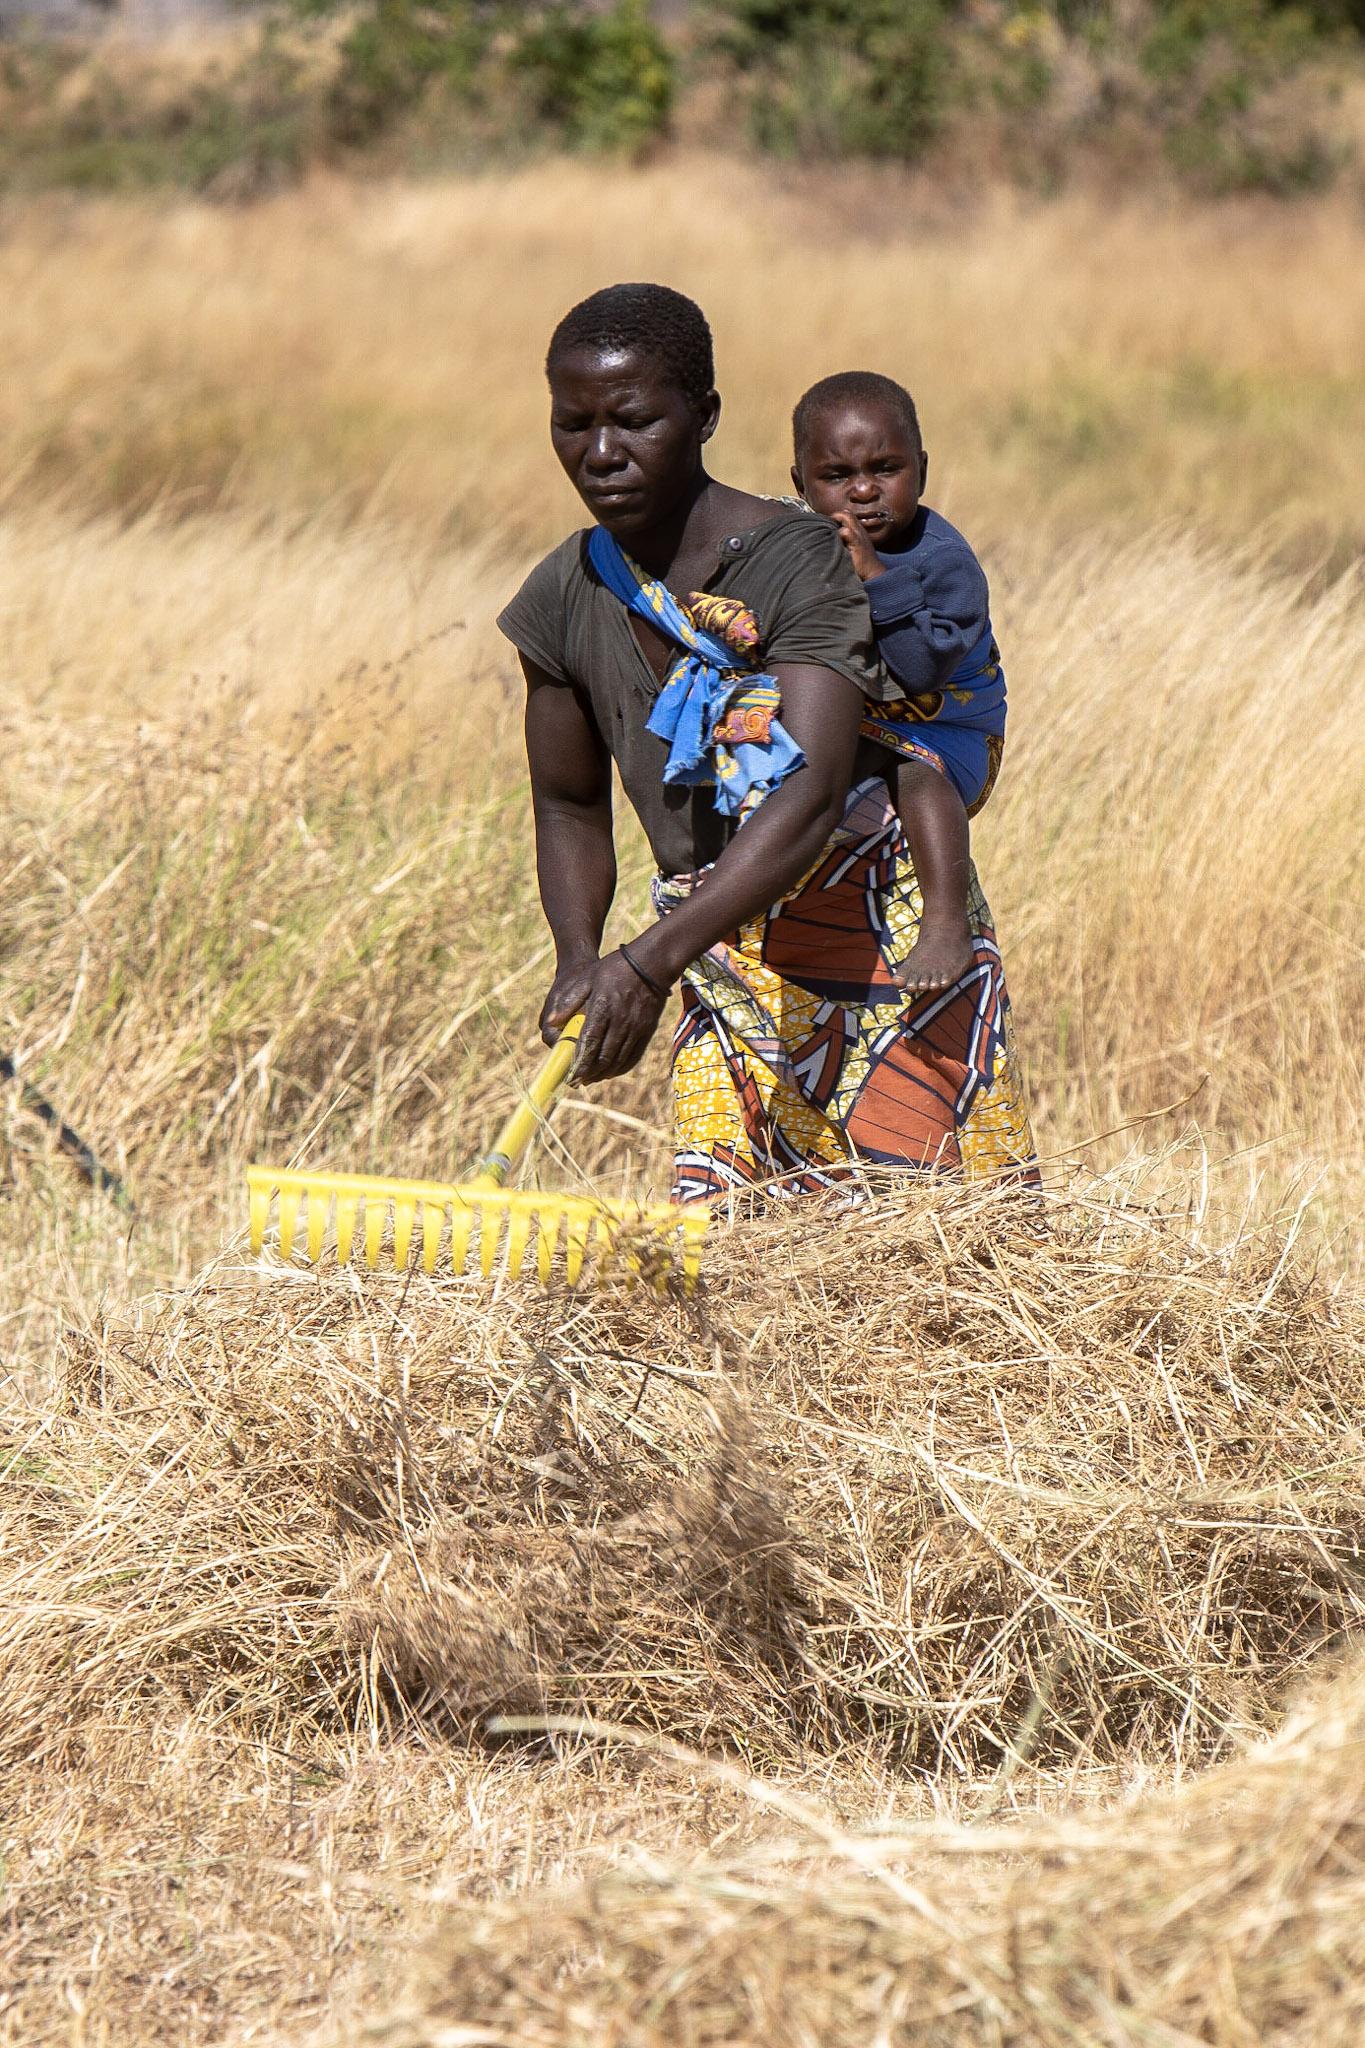 Adam Dickens 2018 - IMS-Naturally Africa, Malawi 3510.jpg